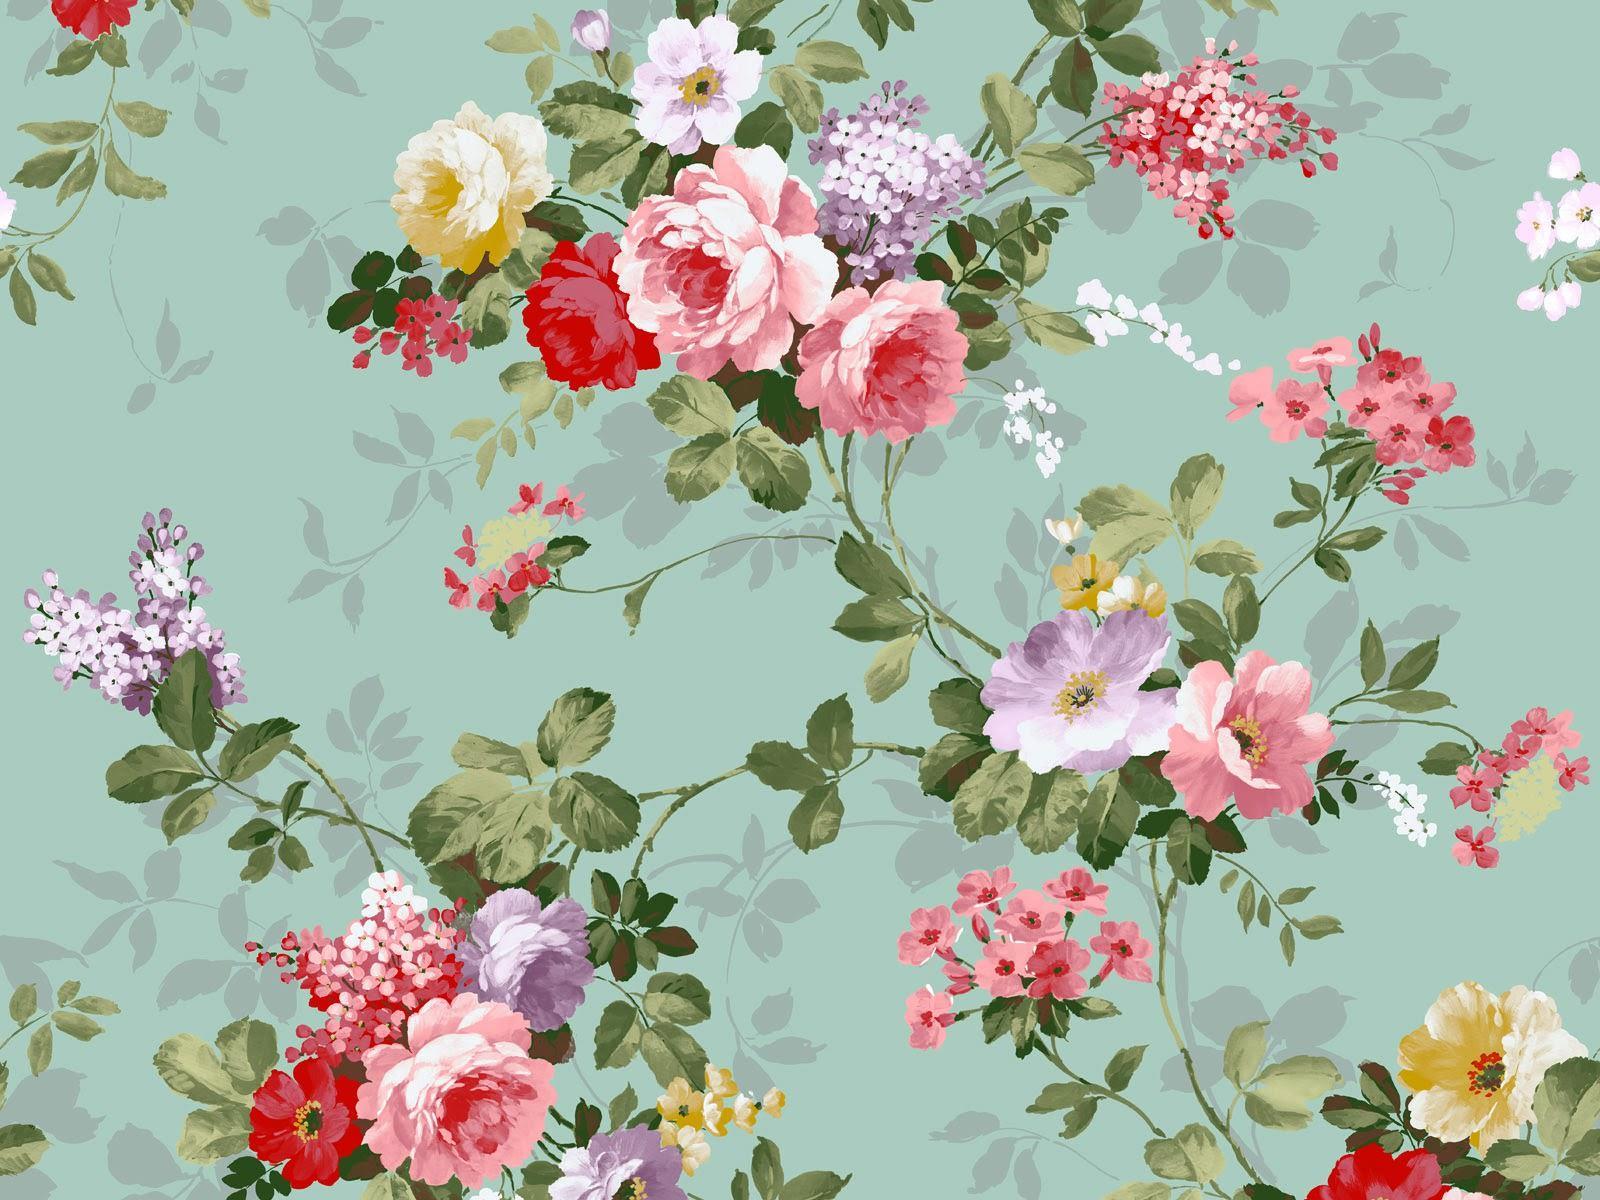 46 Vintage Floral Wallpaper Designs On Wallpapersafari